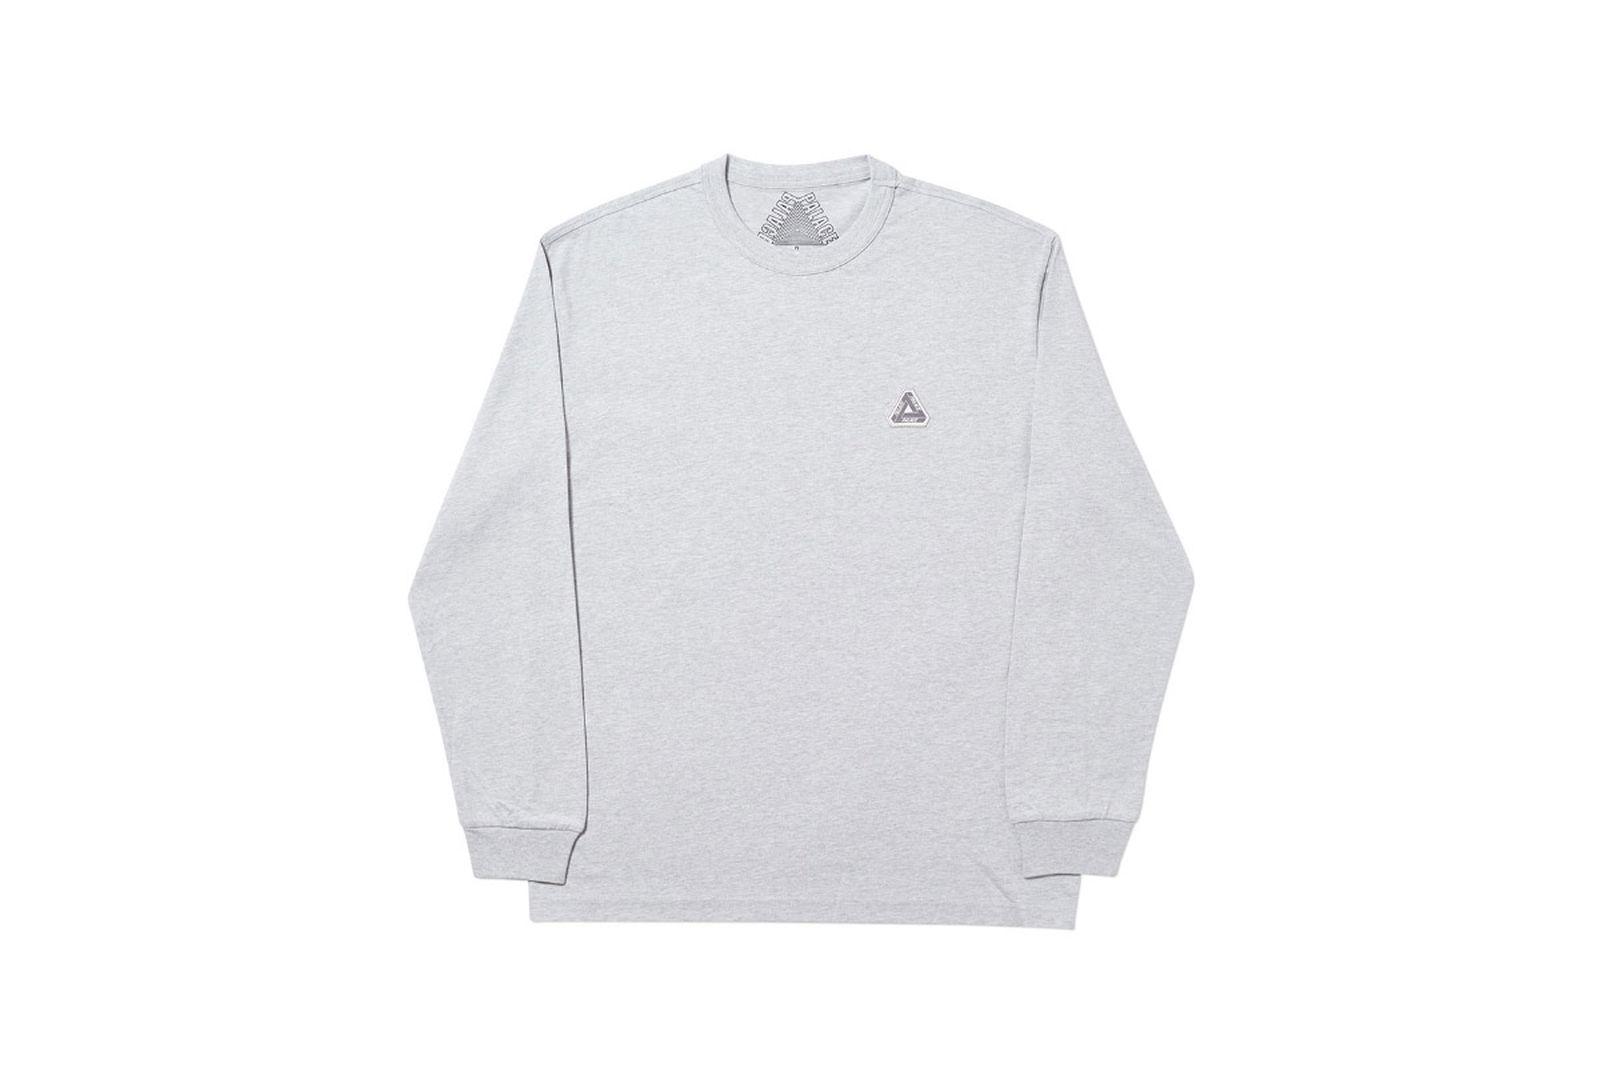 Palace 2019 Autumn Longsleeve T Shirt grey marl